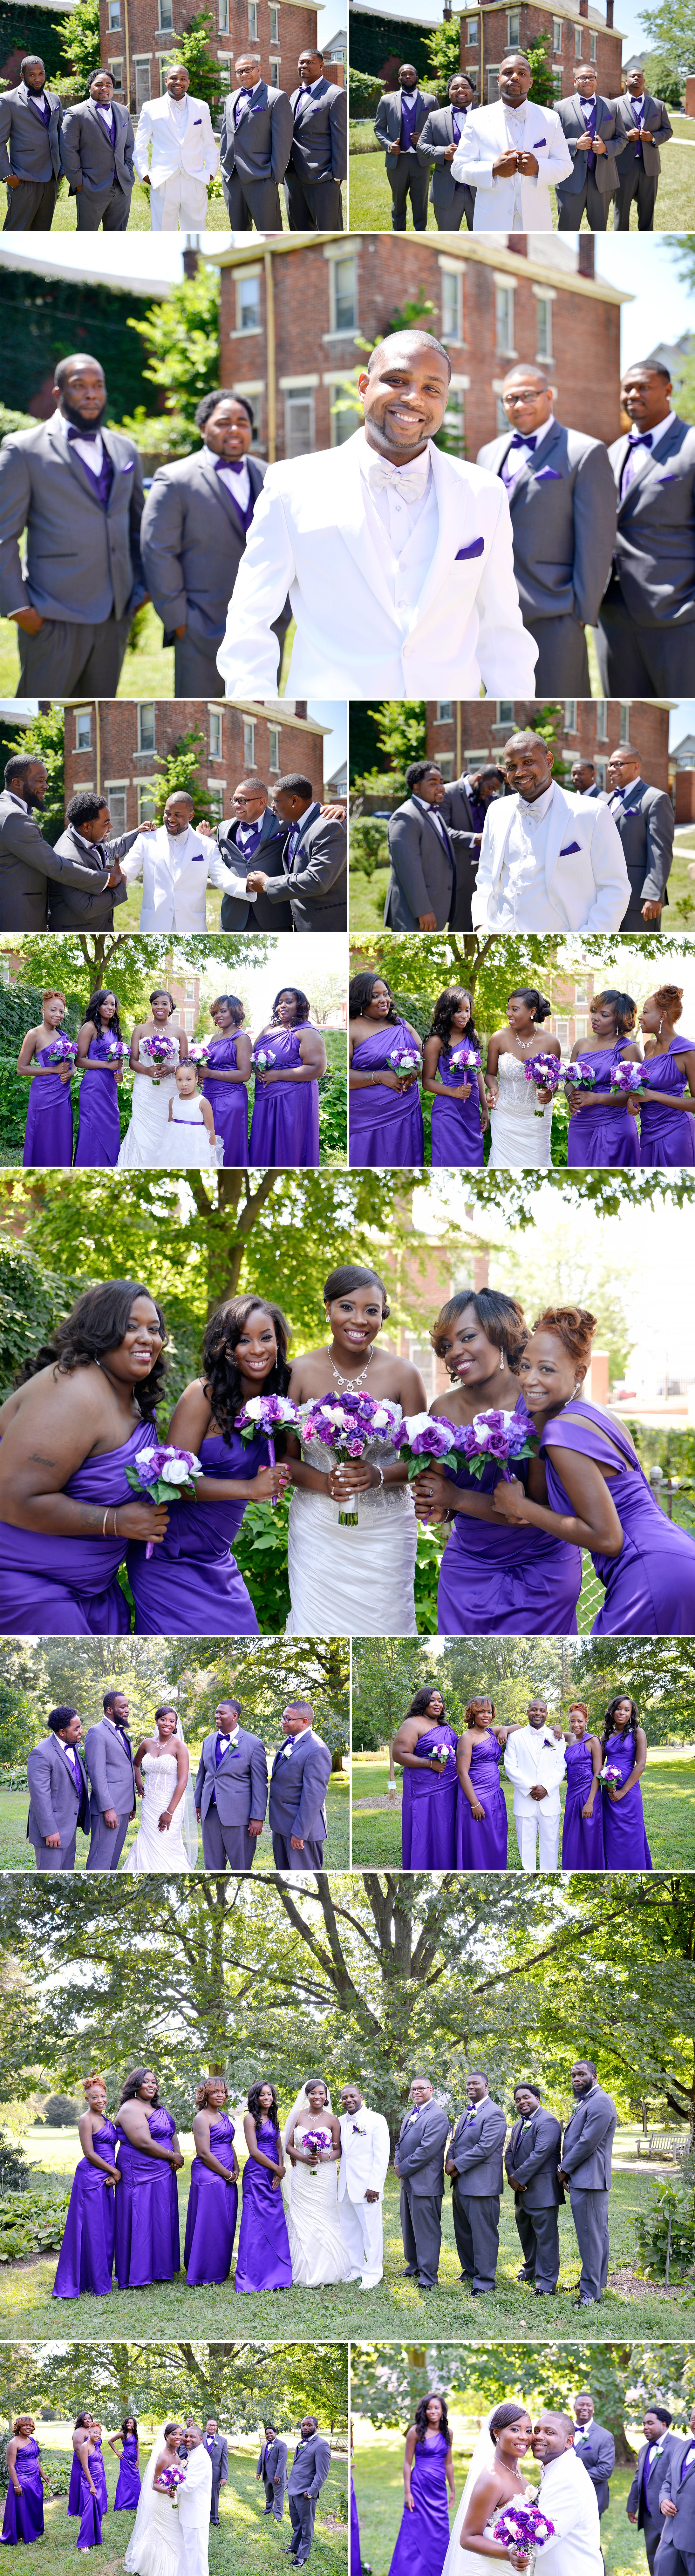 4-wedding photos in park of roses, clintonville ohio